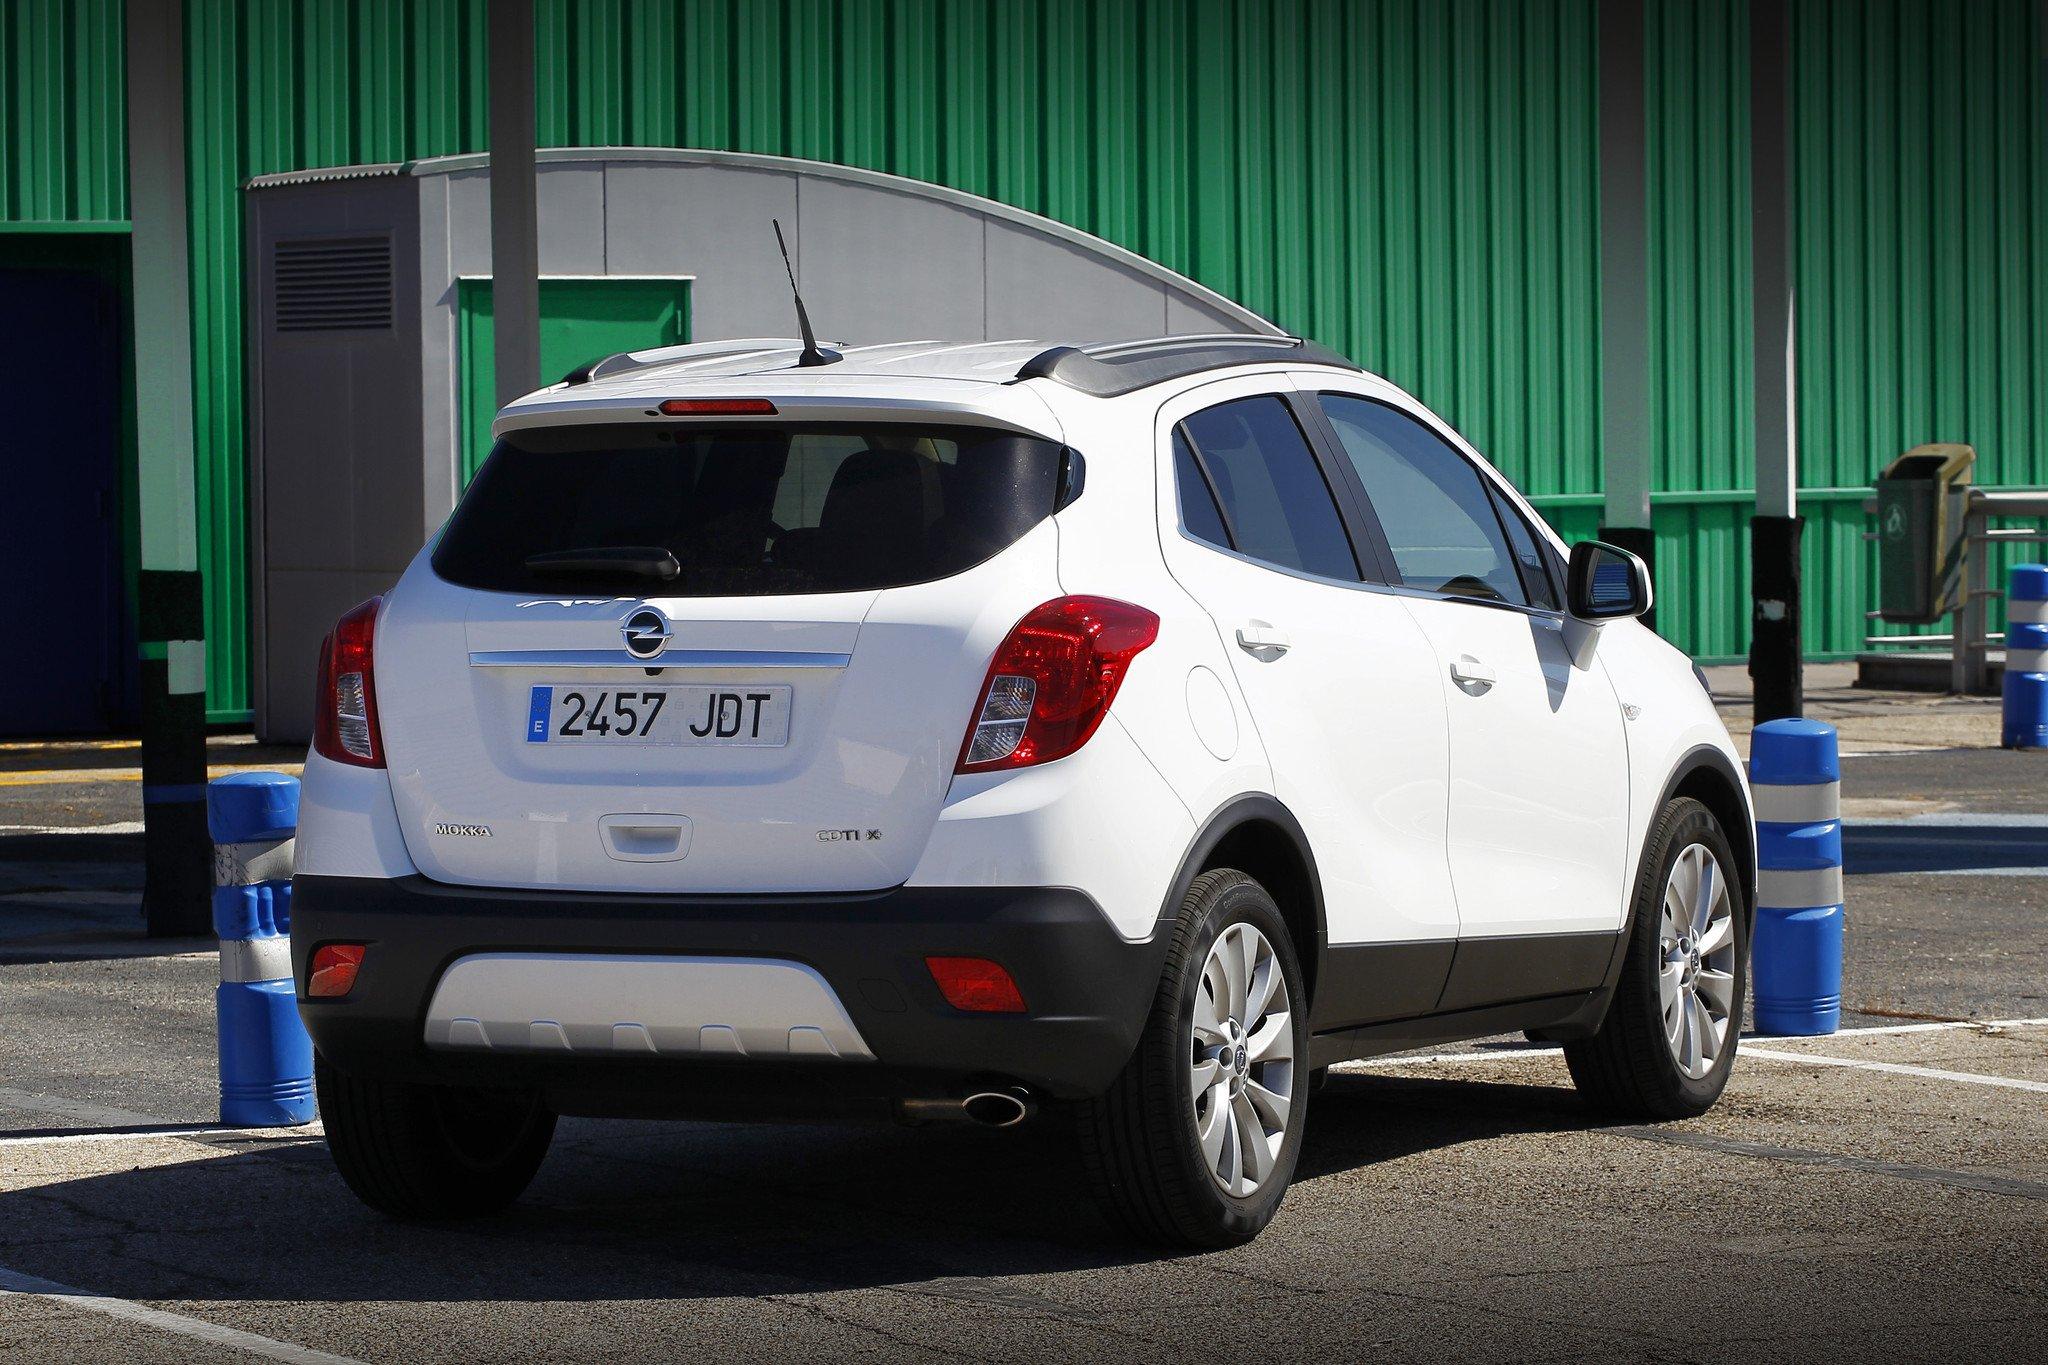 Opel Mokka X 1.6 CDTI Innovation, personalità e sicurezza ...